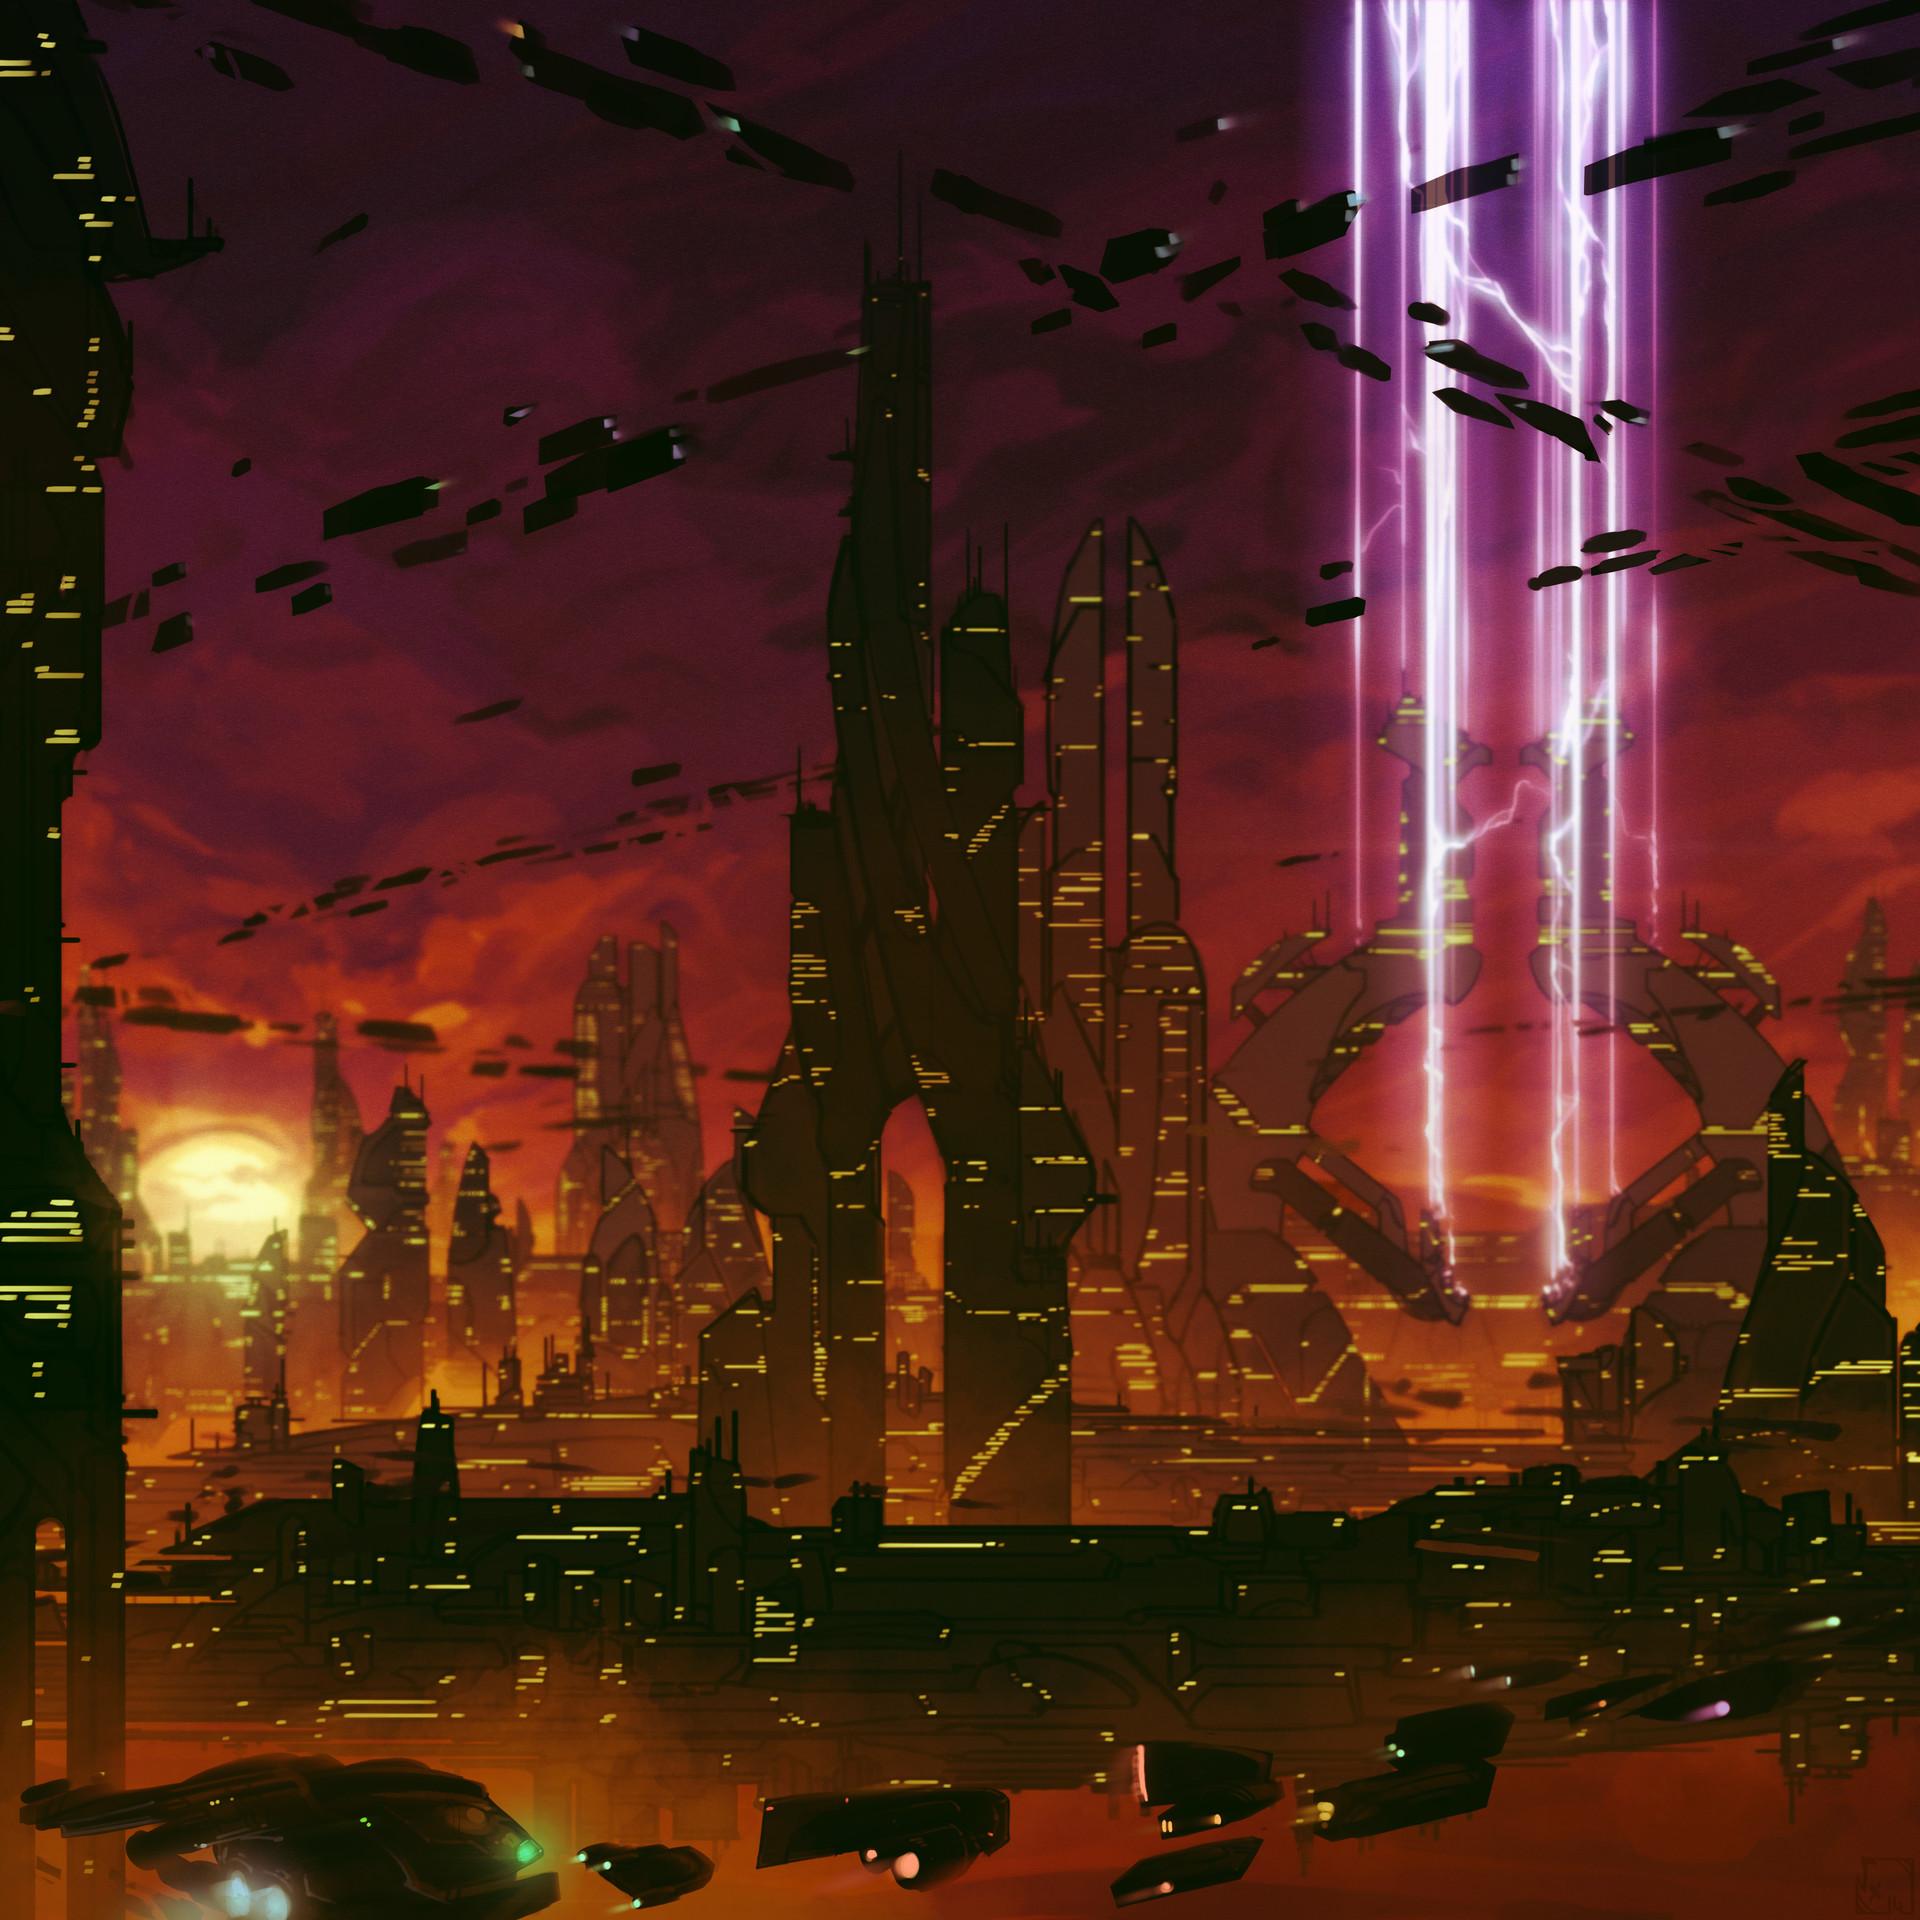 Etienne beschet cityscape